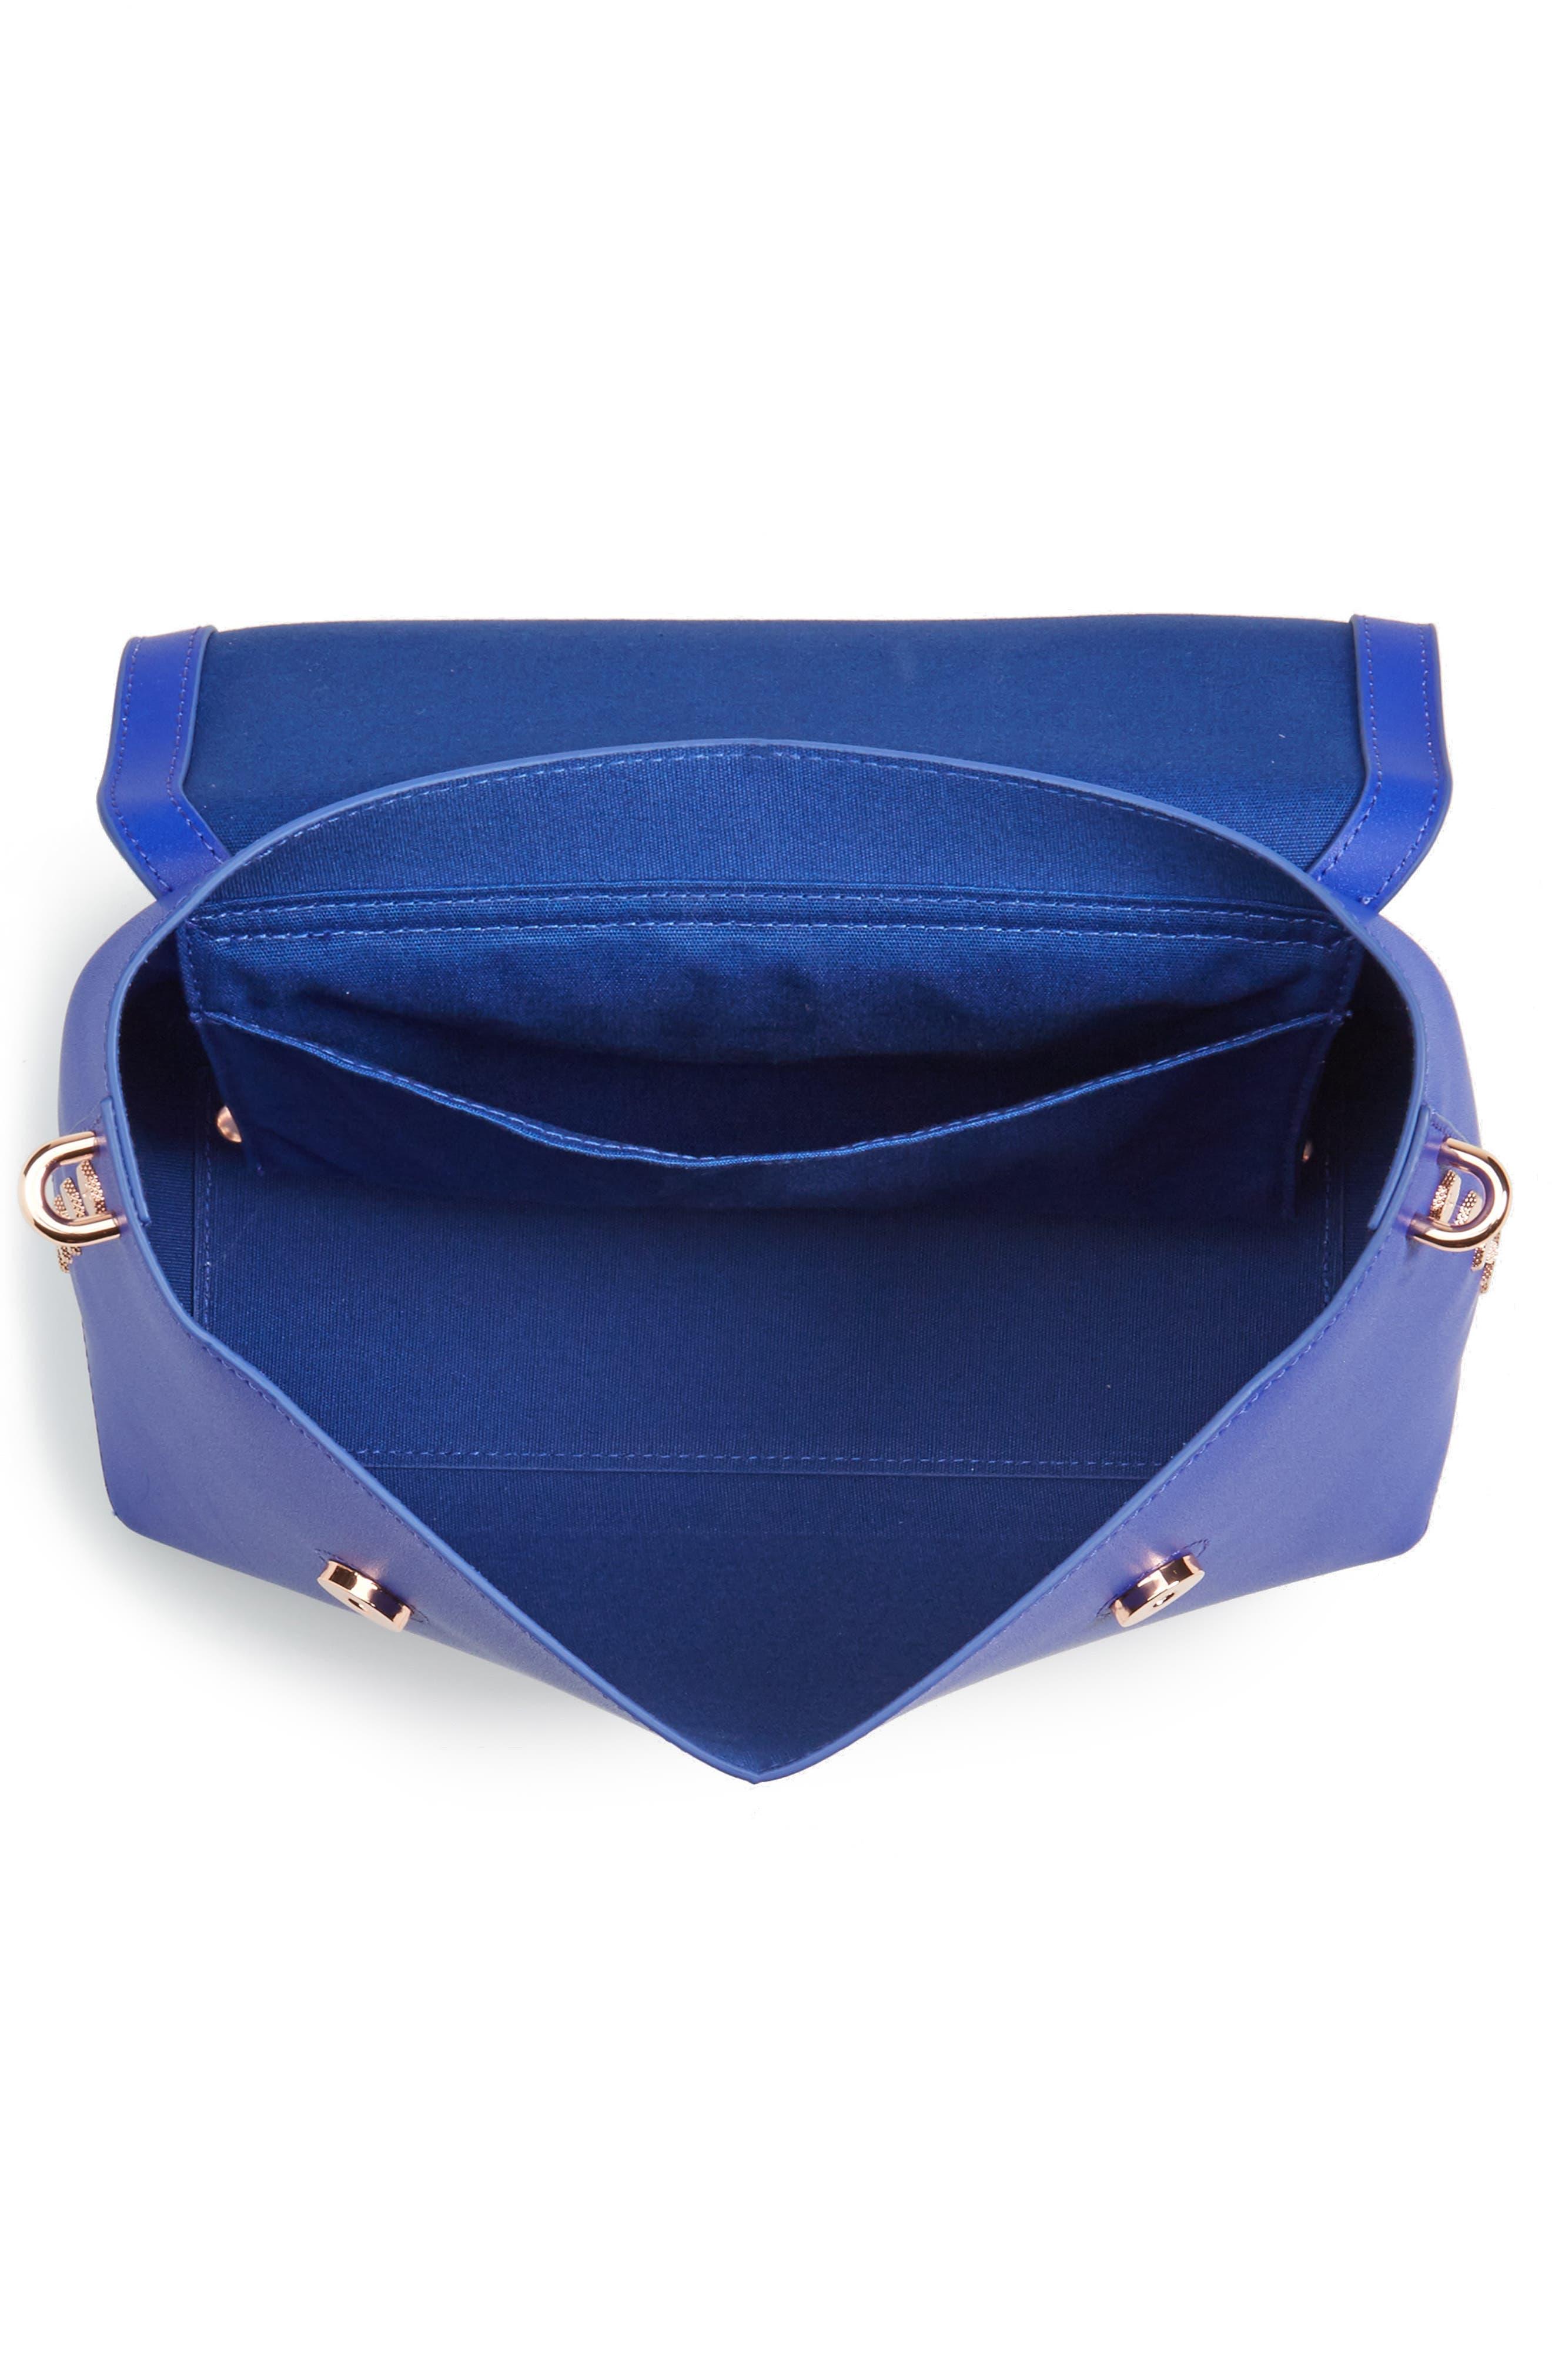 Alternate Image 3  - Ted Baker London Taymar - Studded Edge Lady Bag Leather Top Handle Satchel